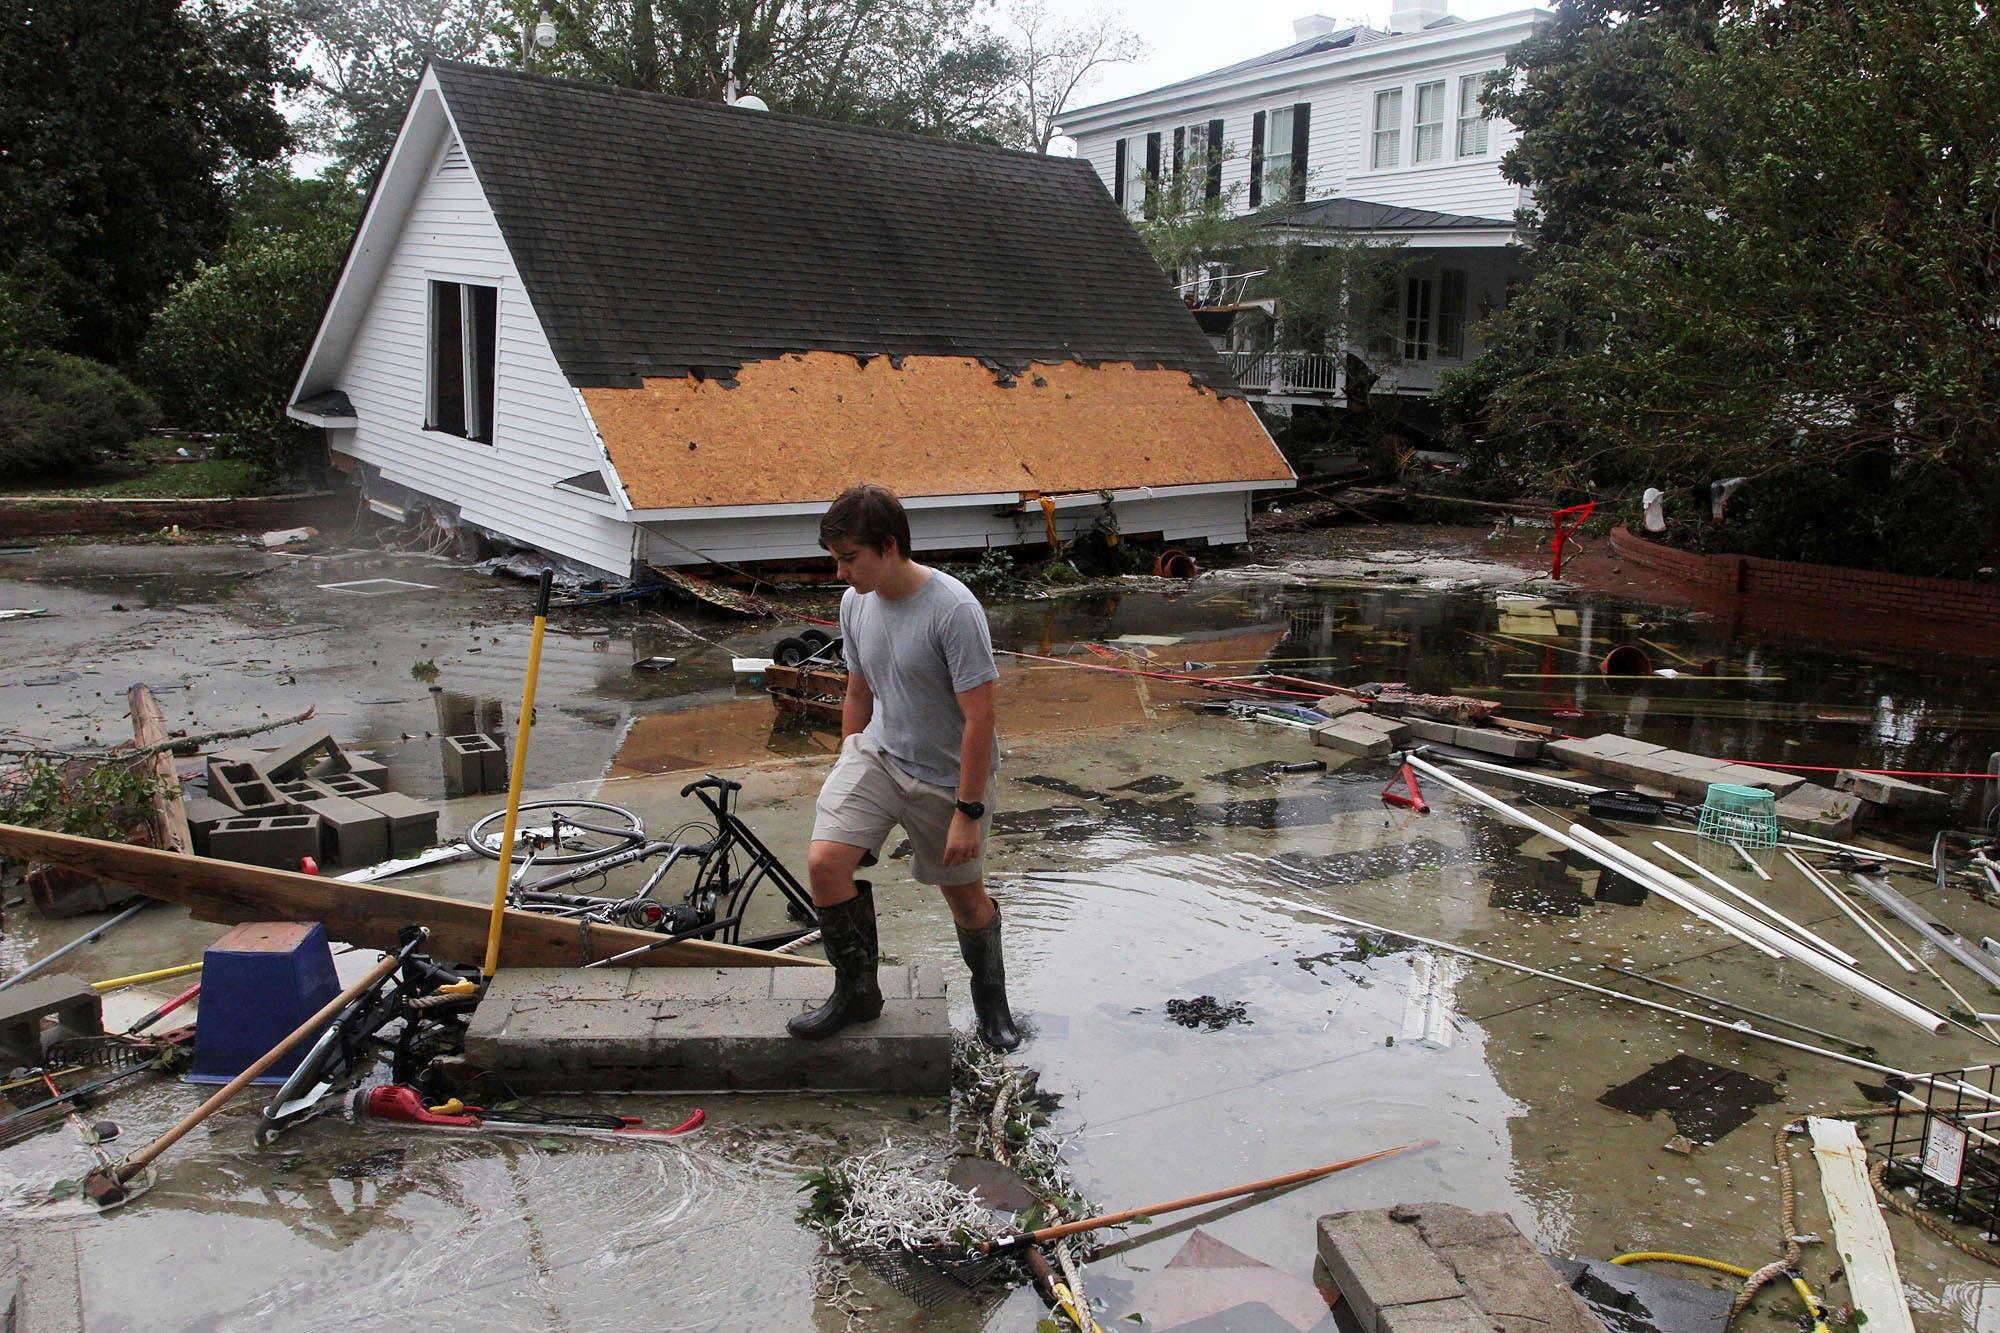 Aumentan a 13 los muertos por Florence, que se degrada a depresión tropical